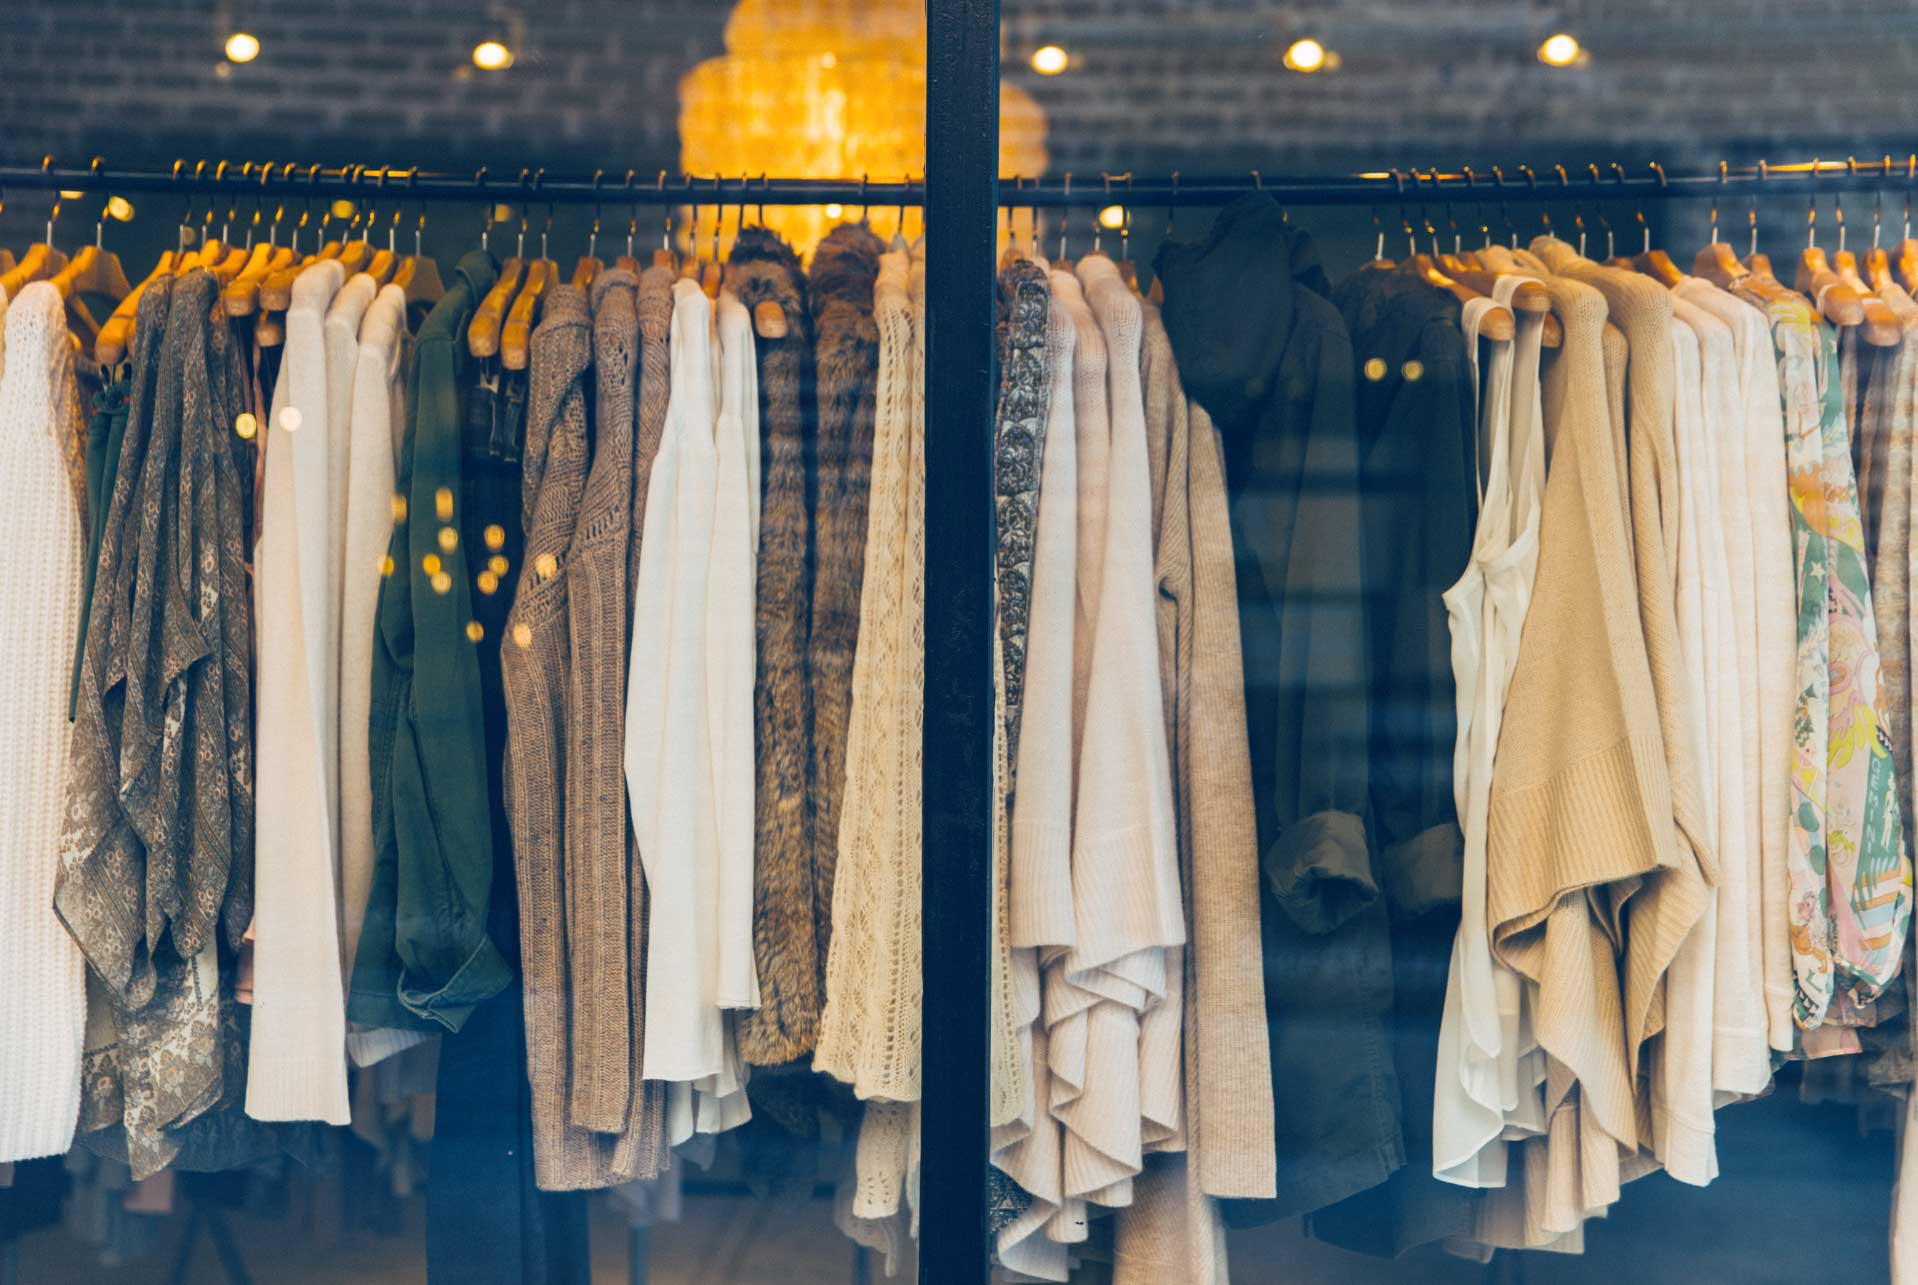 2 stylish friends looking at a consumer shopping app | PredictSpring